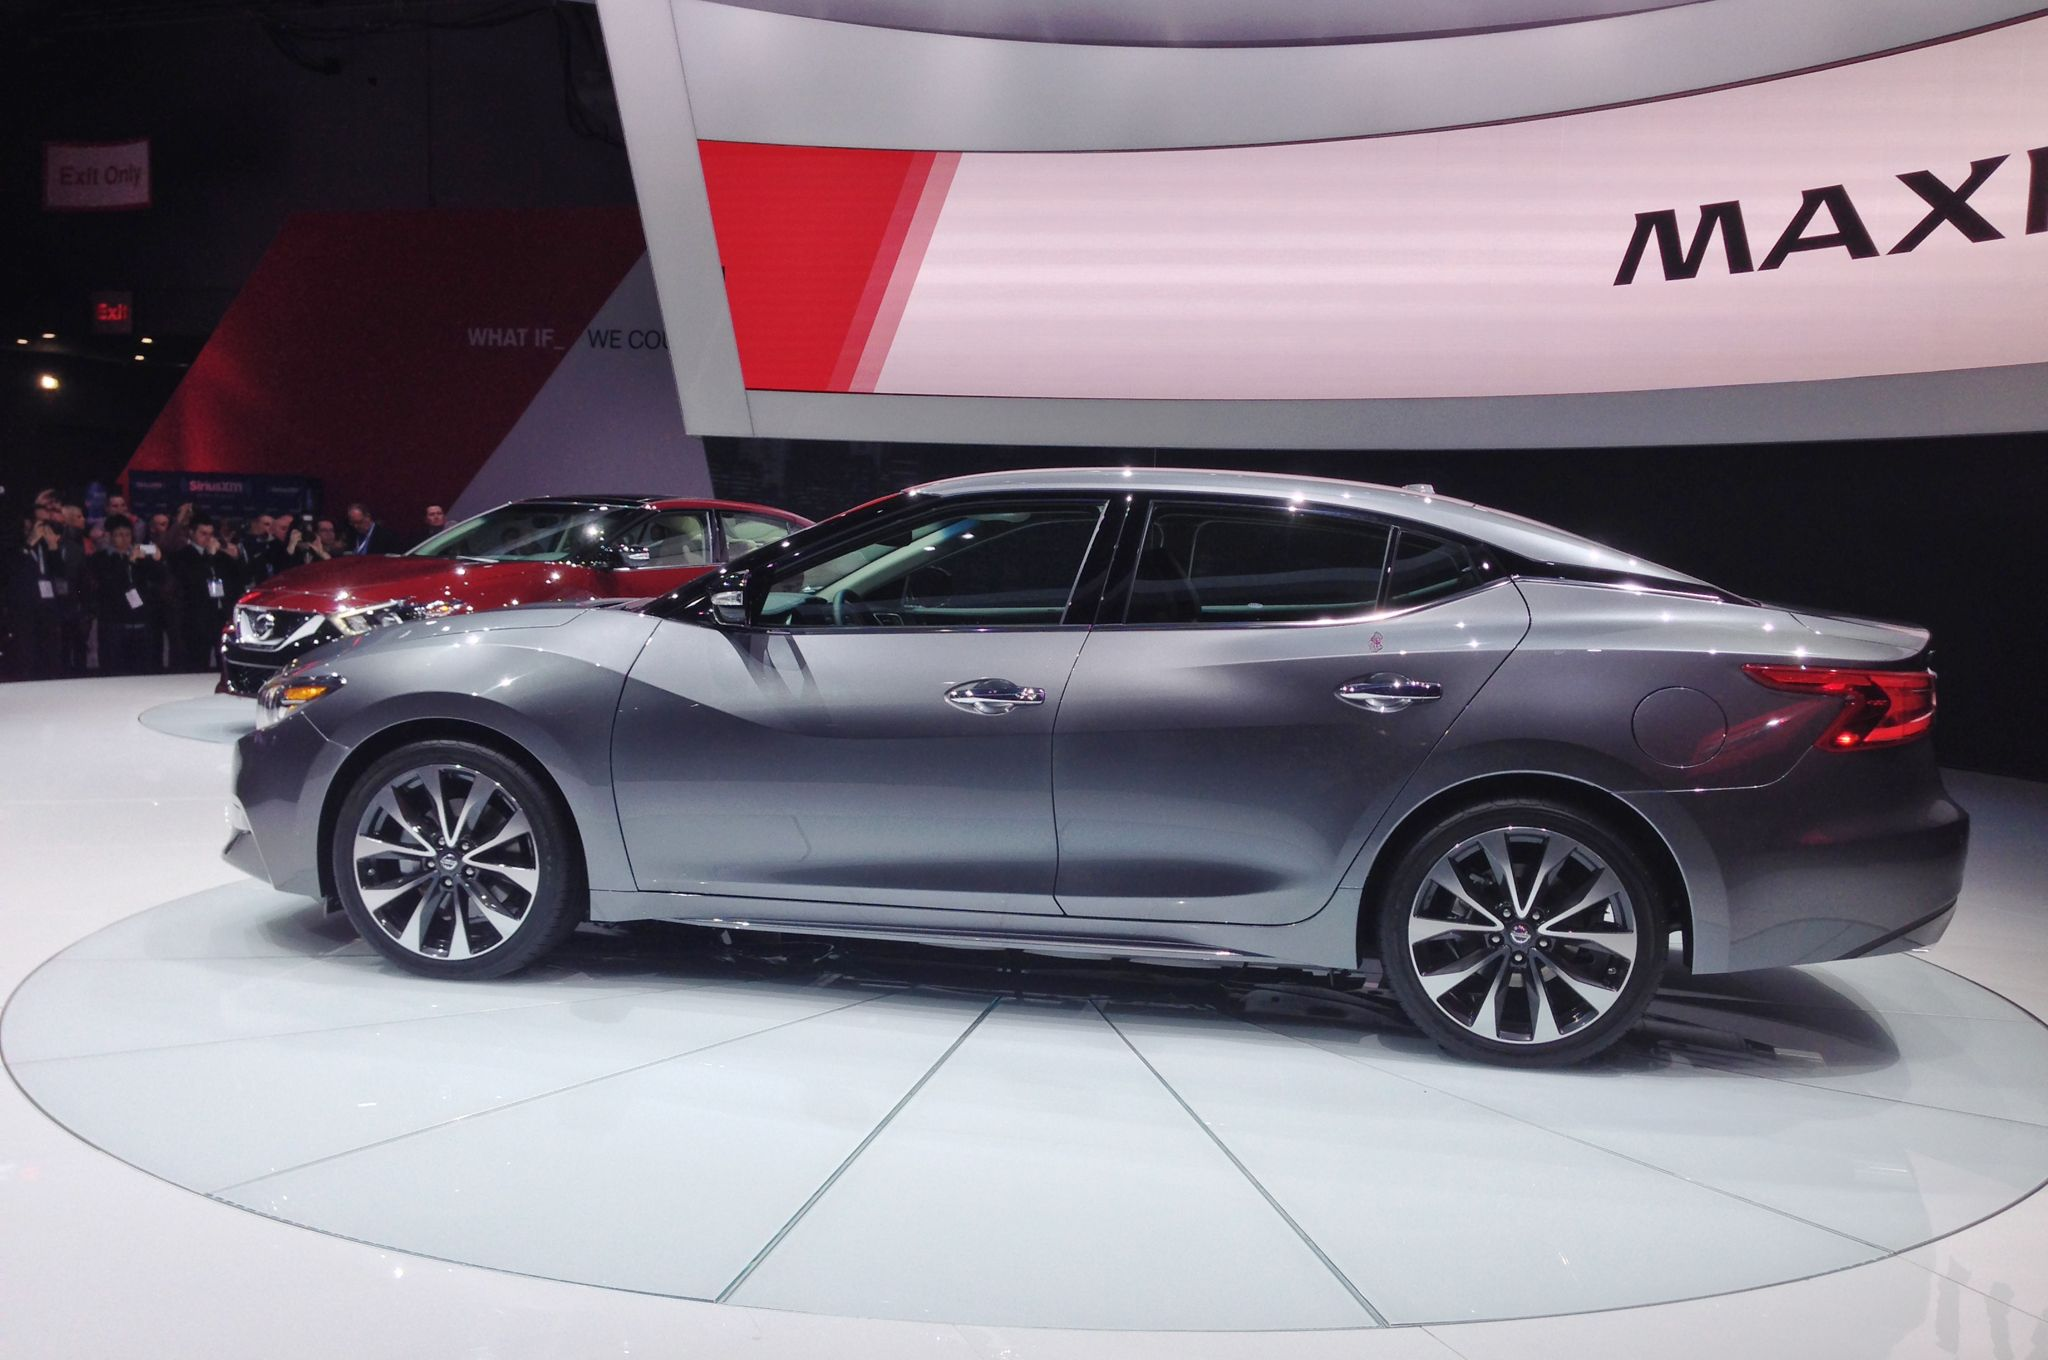 2019 Nissan Maxima Redesign | carmodel | Nissan maxima ...